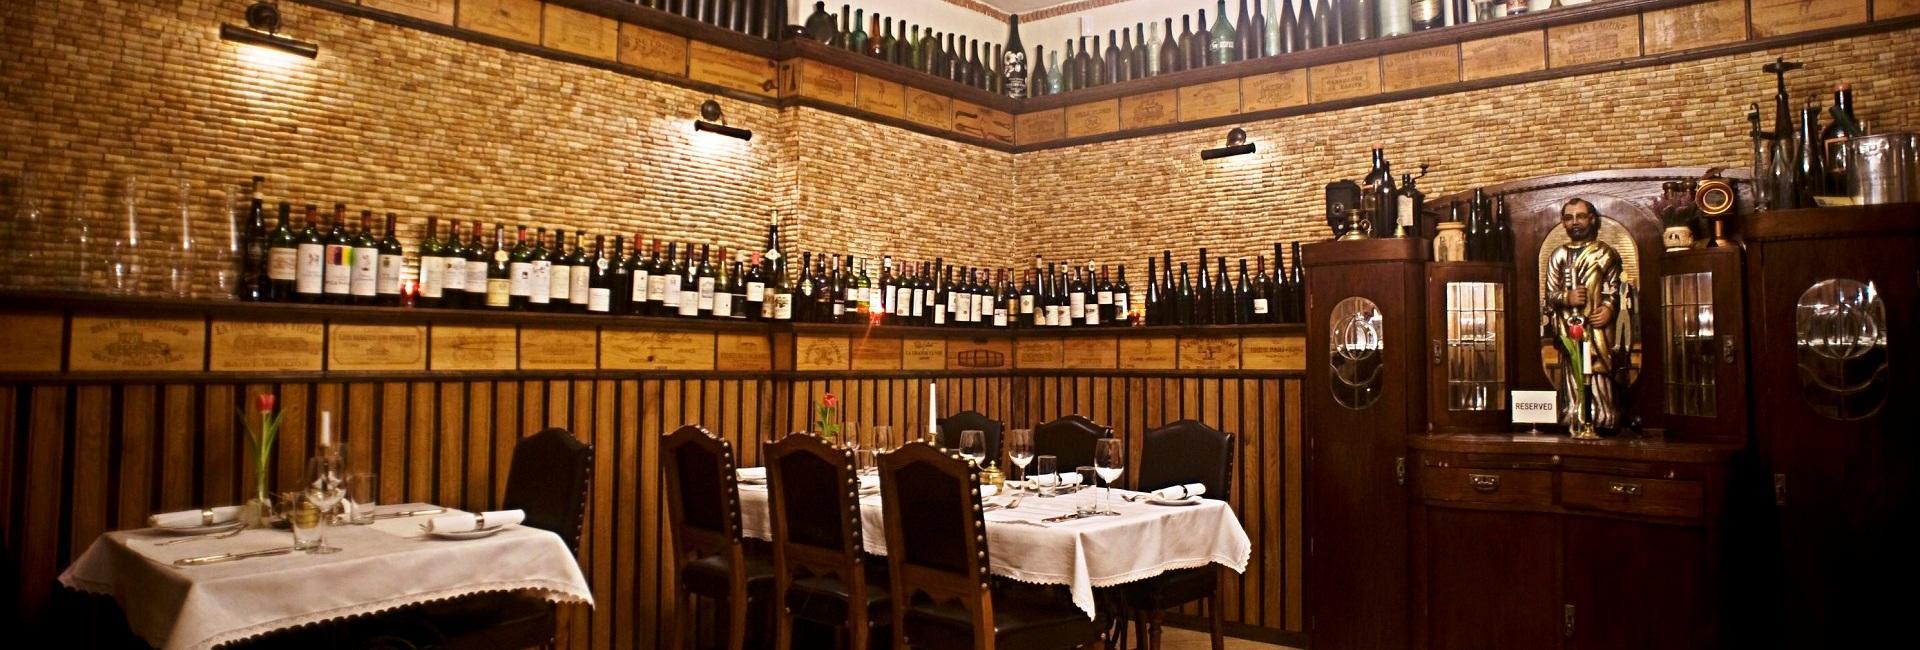 Restaurant at Chotynia Manor House in in Sobolew